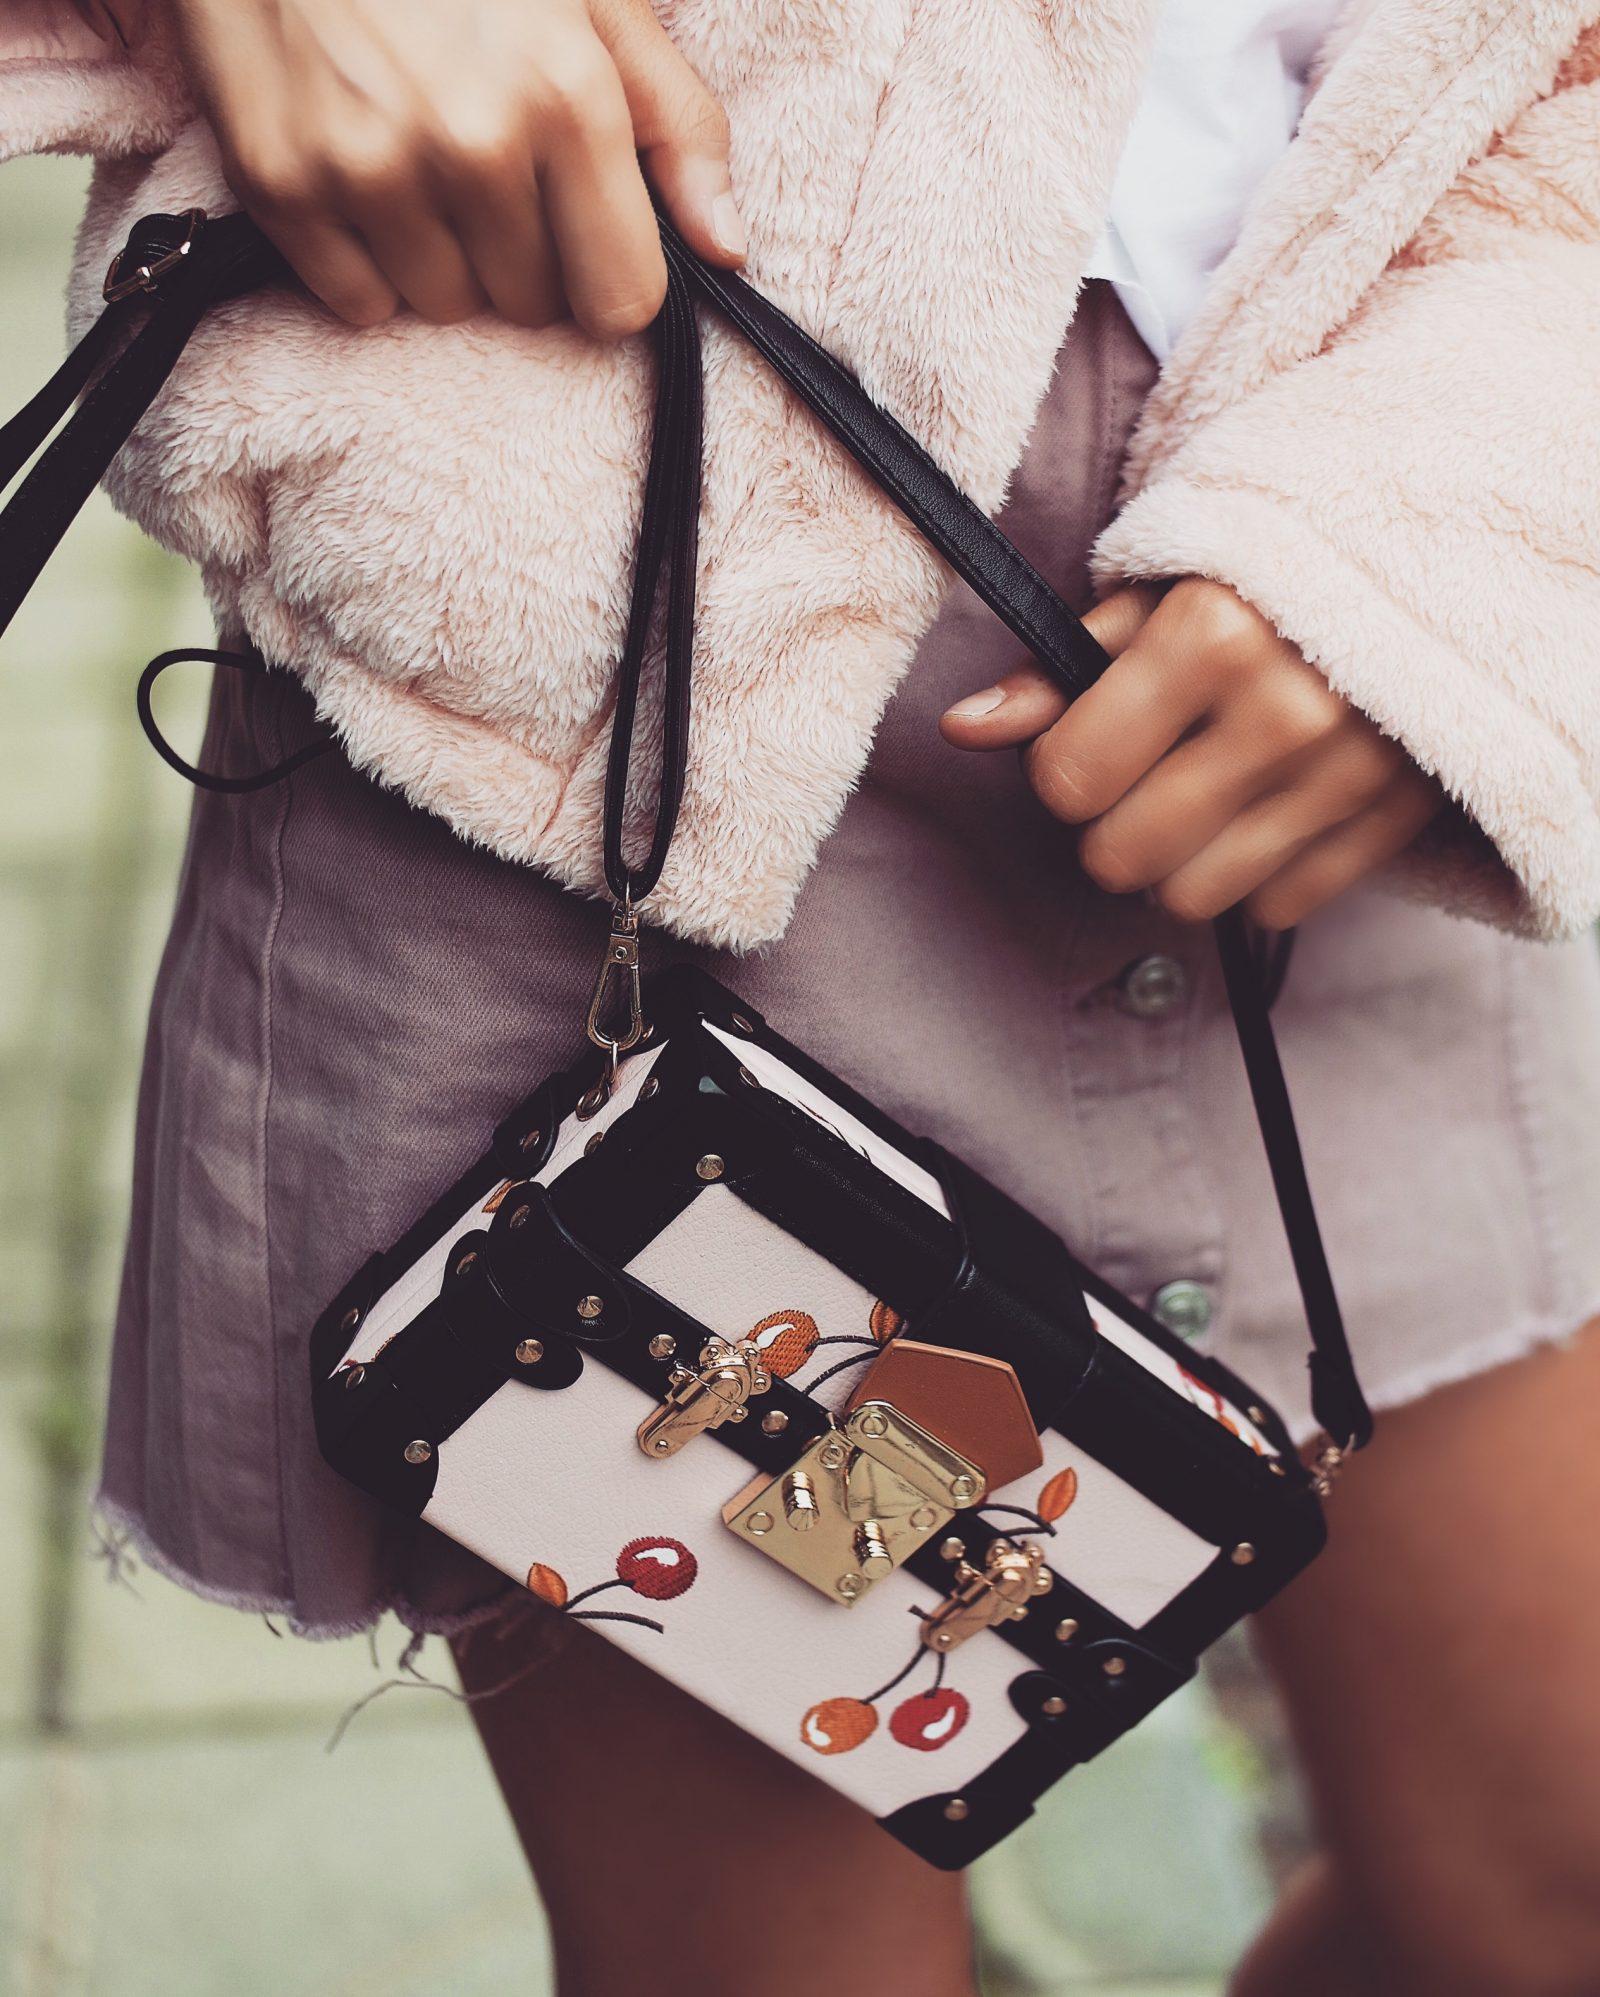 Teddy Puffa Jacket - Louis Vuitton Petite Malle Dupe